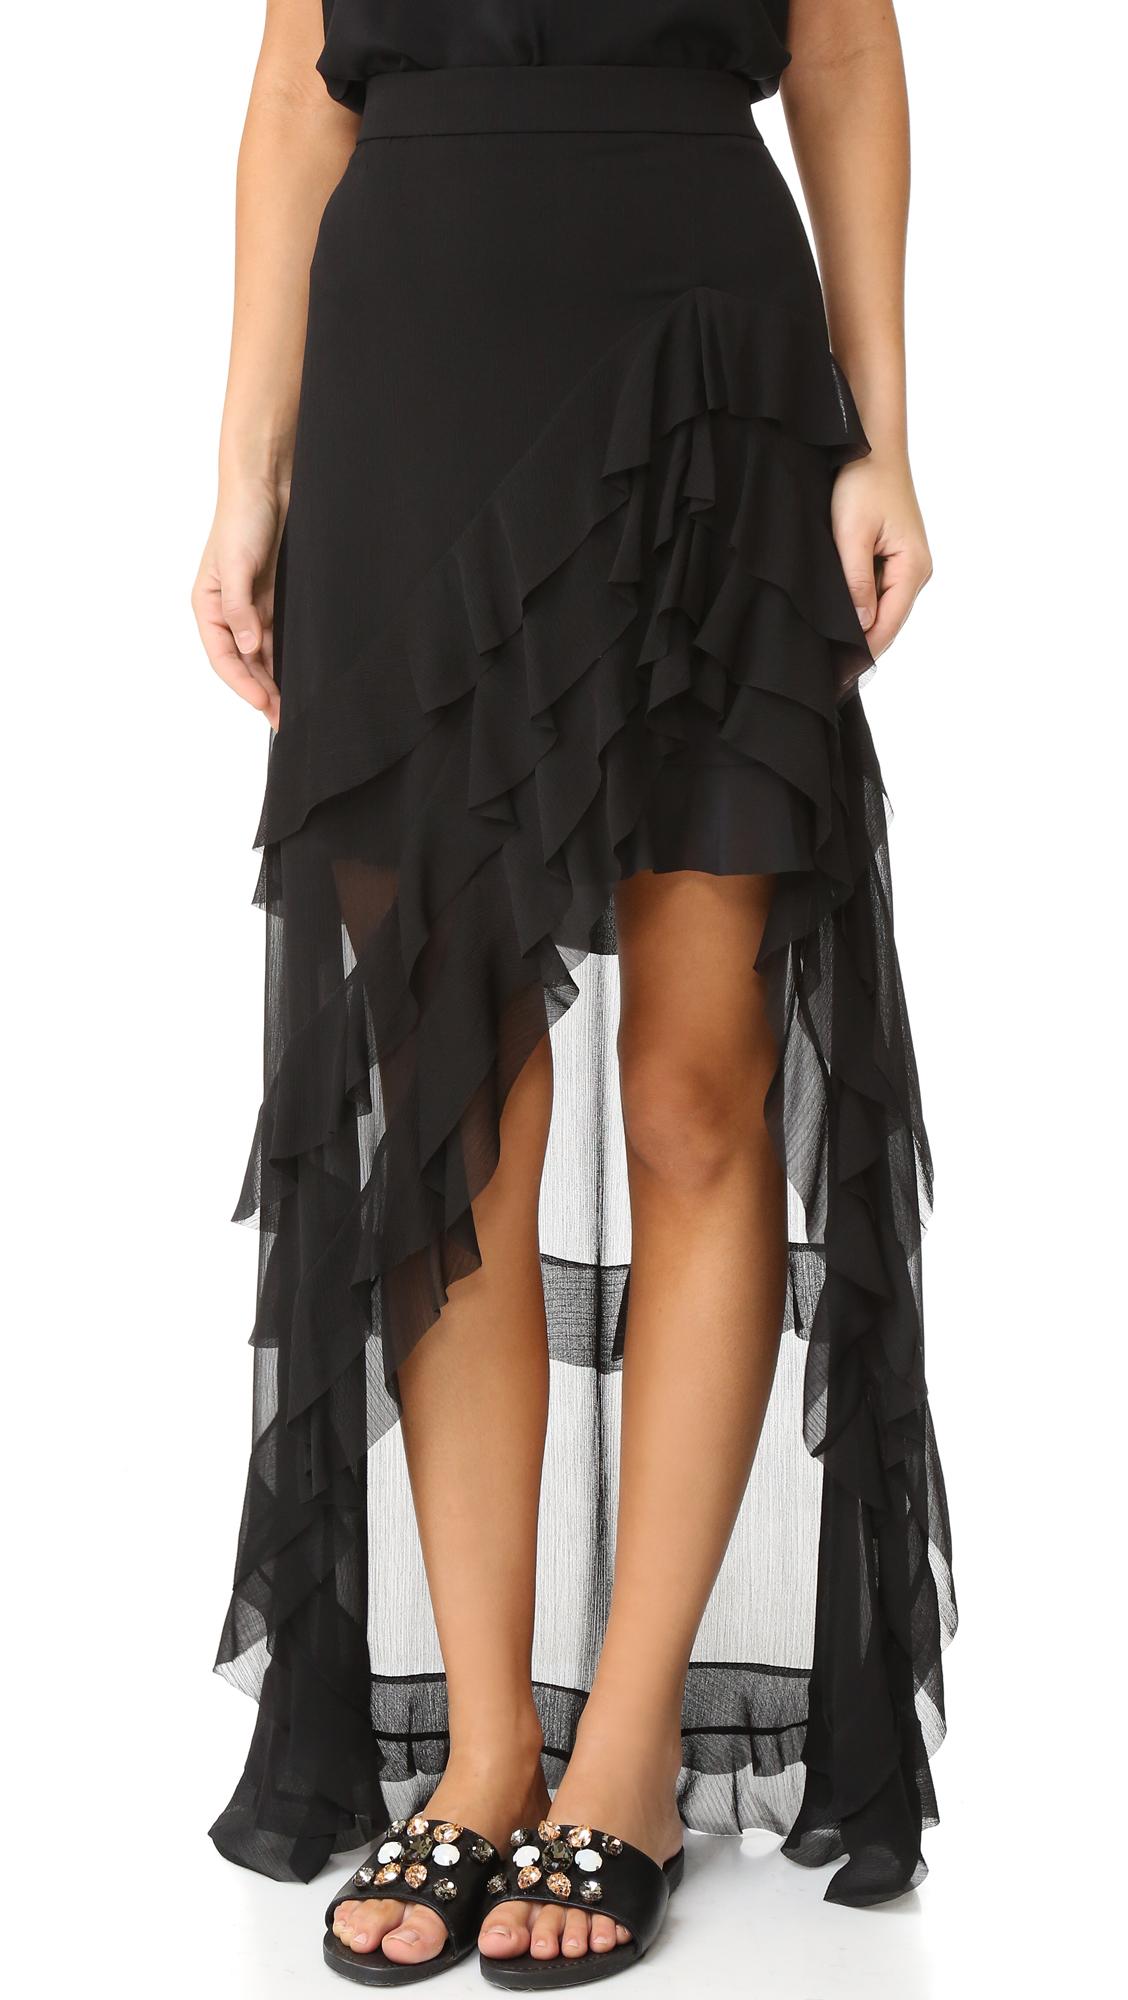 Alice + Olivia Lavera Asymmetrical Layered Ruffle Skirt - Black at Shopbop